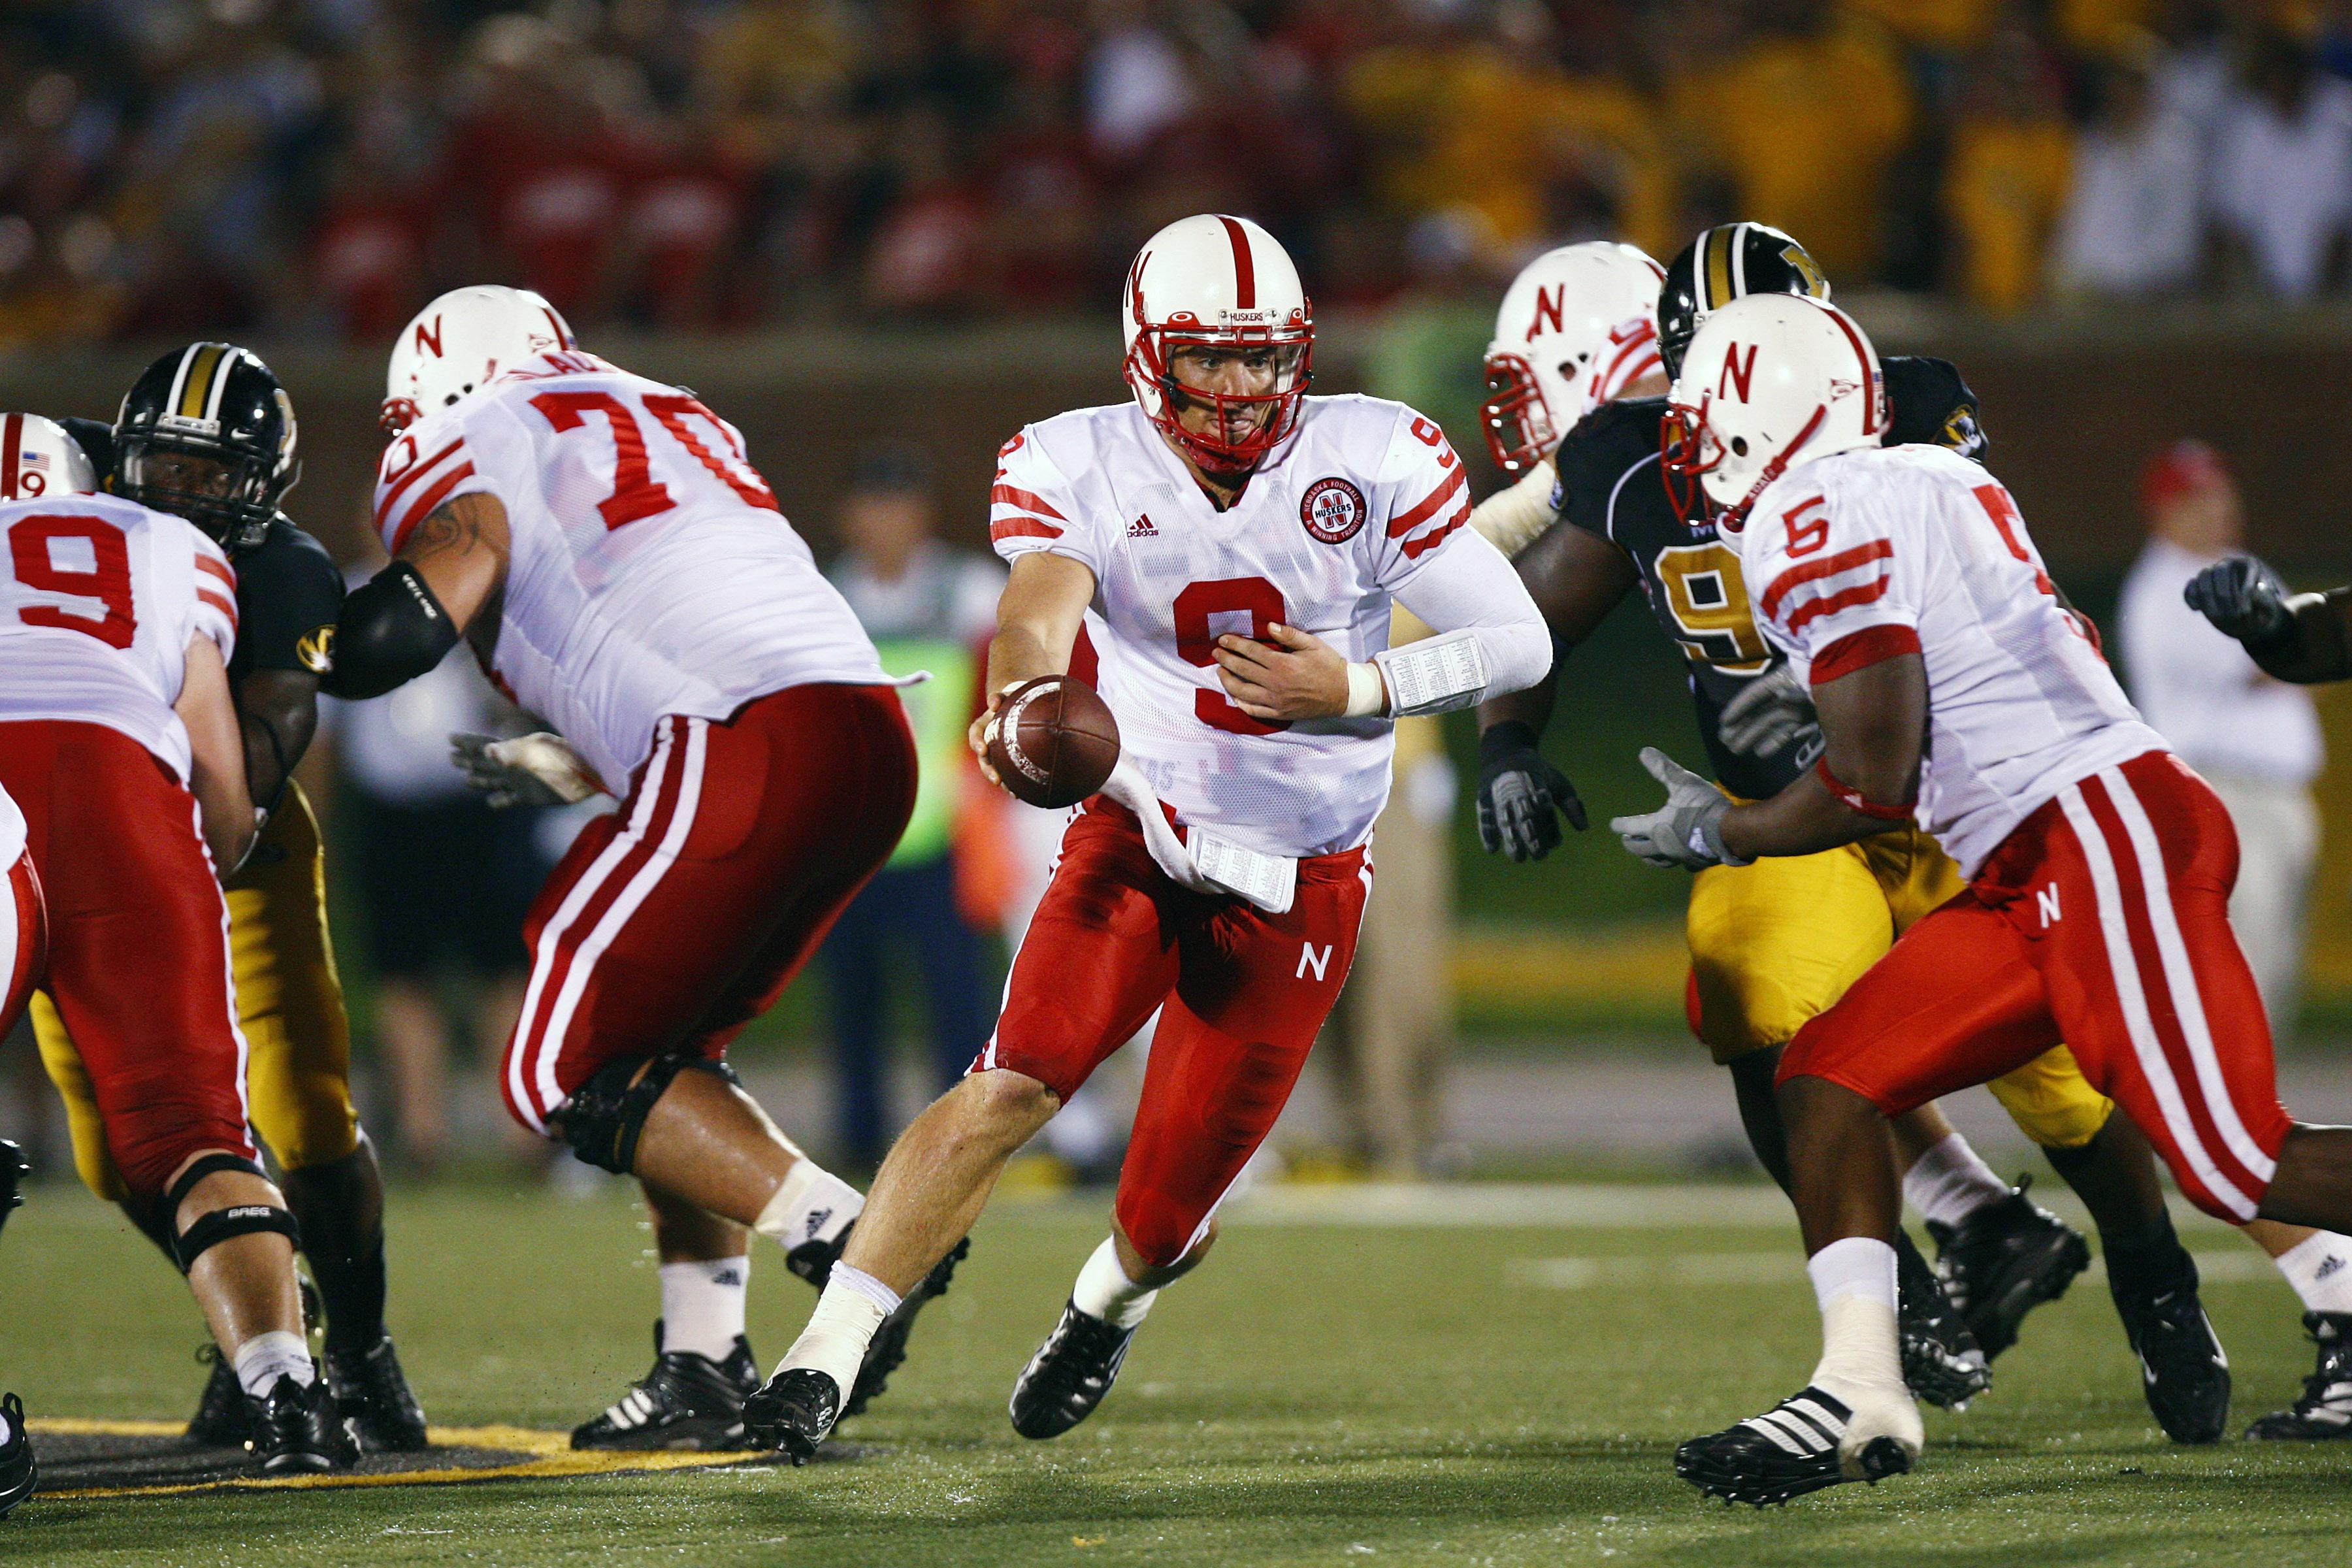 Sam Keller, then #9 of the Nebraska Cornhuskers, plays in a game against Missouri in 2007 in Columbia, Missouri.